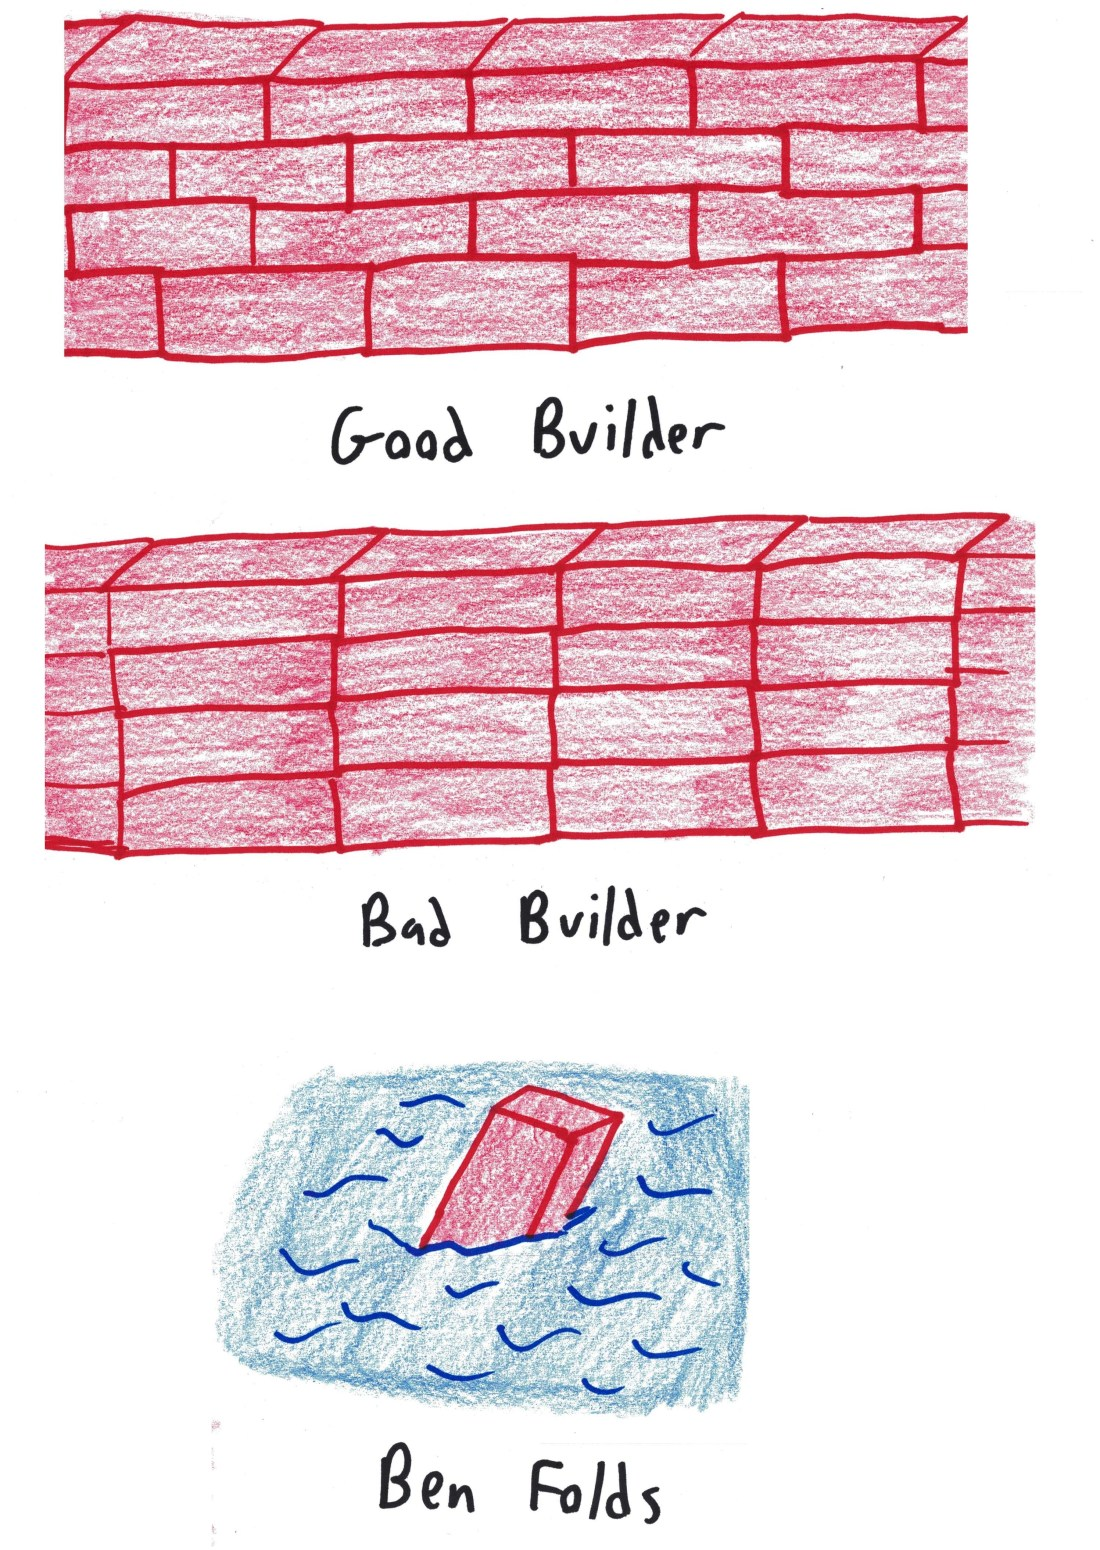 2017.10.20 brick